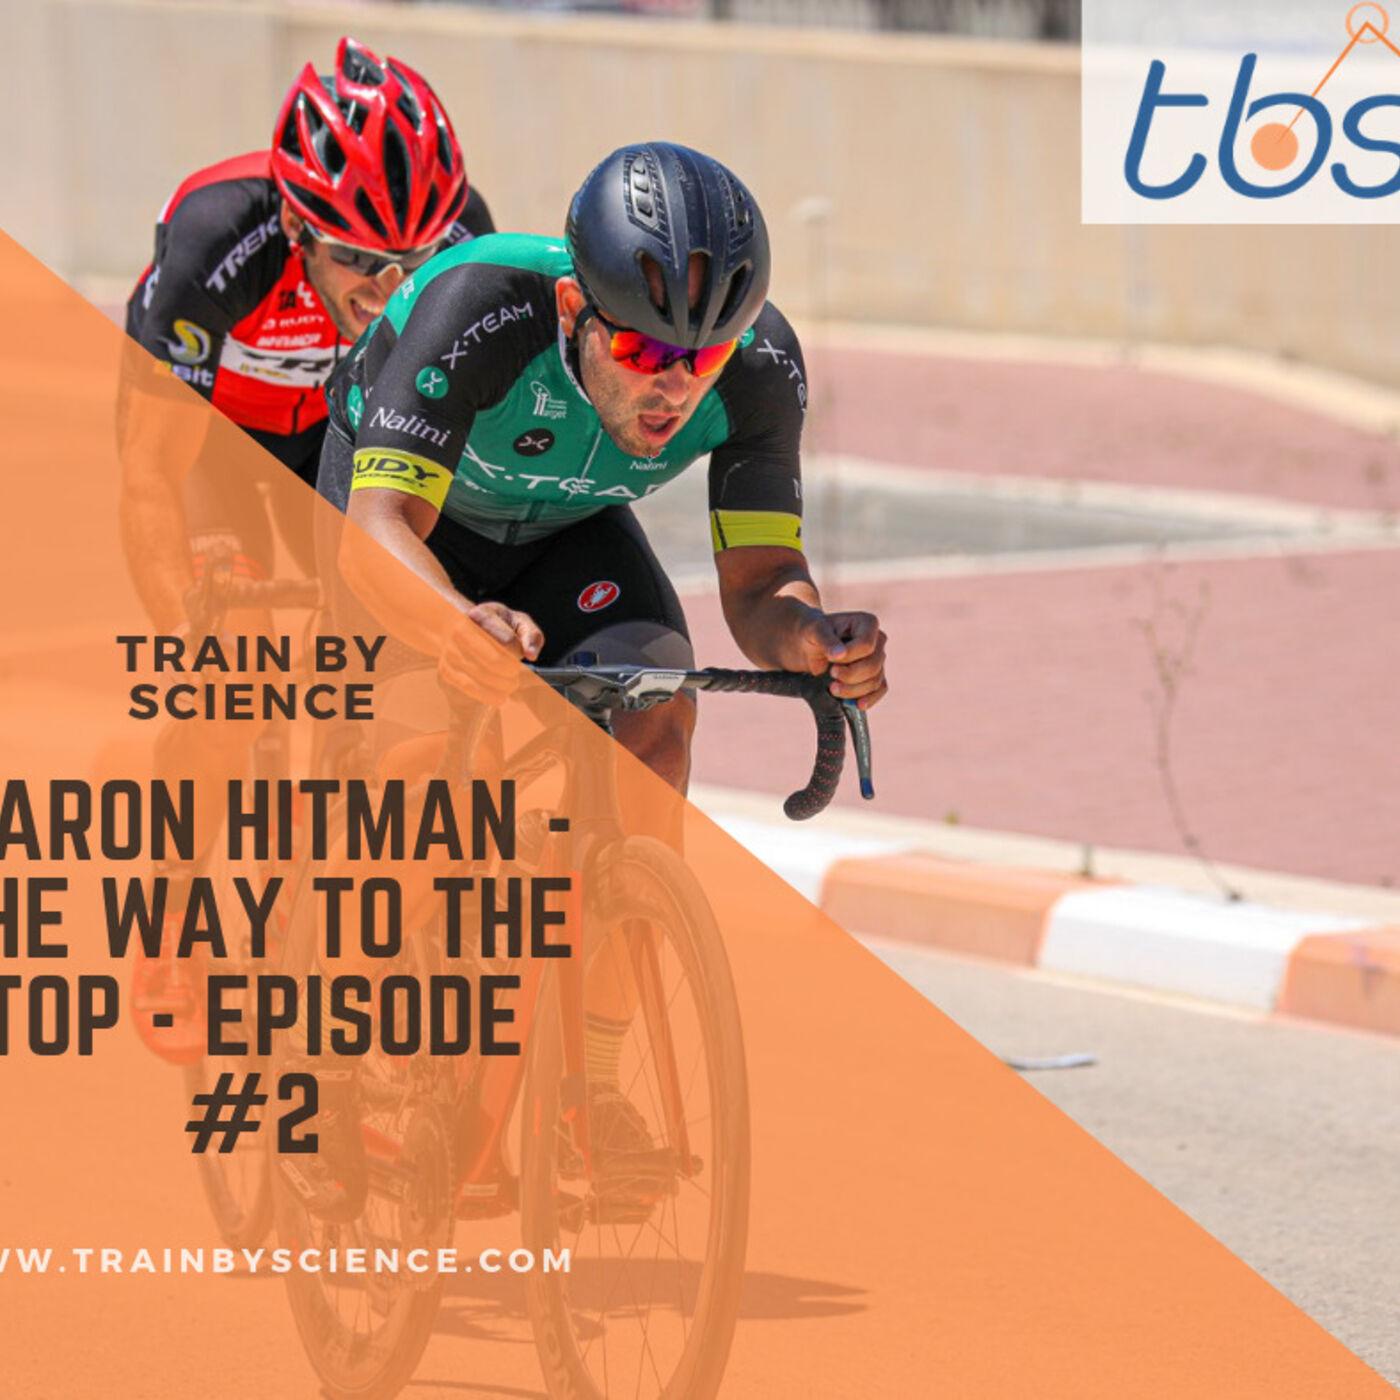 Aaron Hitman - The Way to the Top - Episode #2